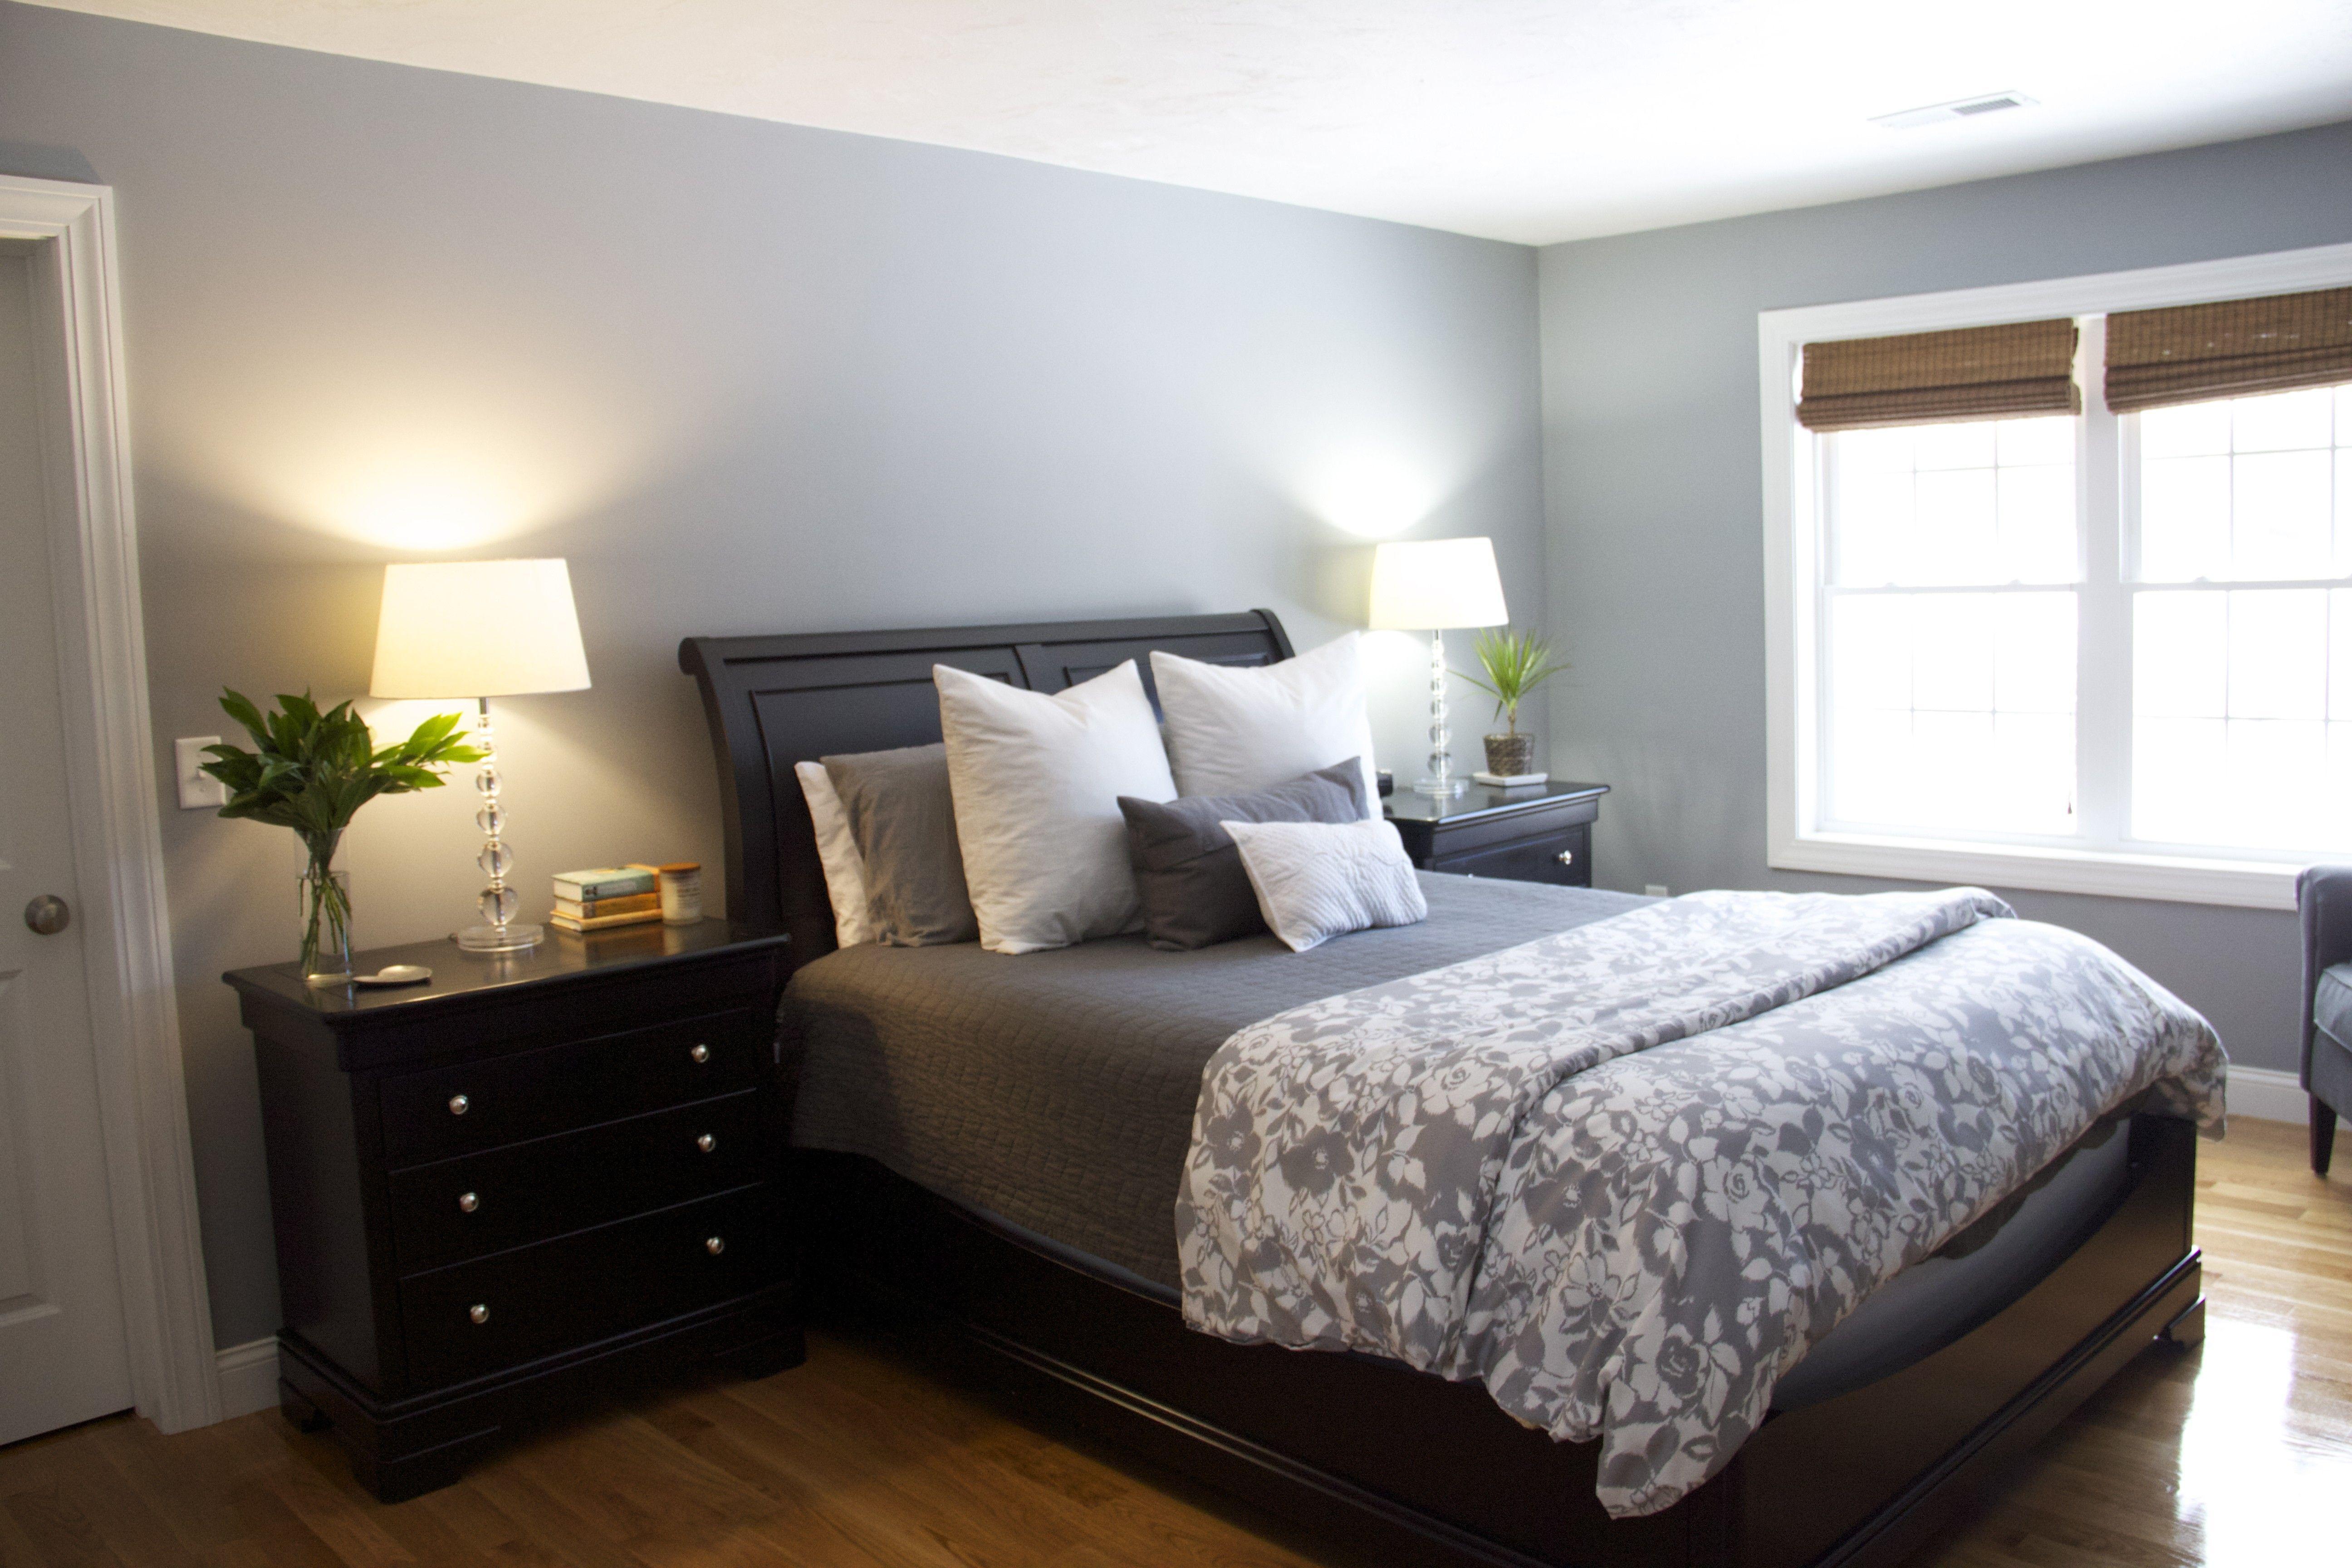 Best Of Master Bedroom Design Ideas Master Bedroom Decorating Design Ideas Modern Master Apartment Bedroom Decor Small Master Bedroom Master Bedrooms Decor